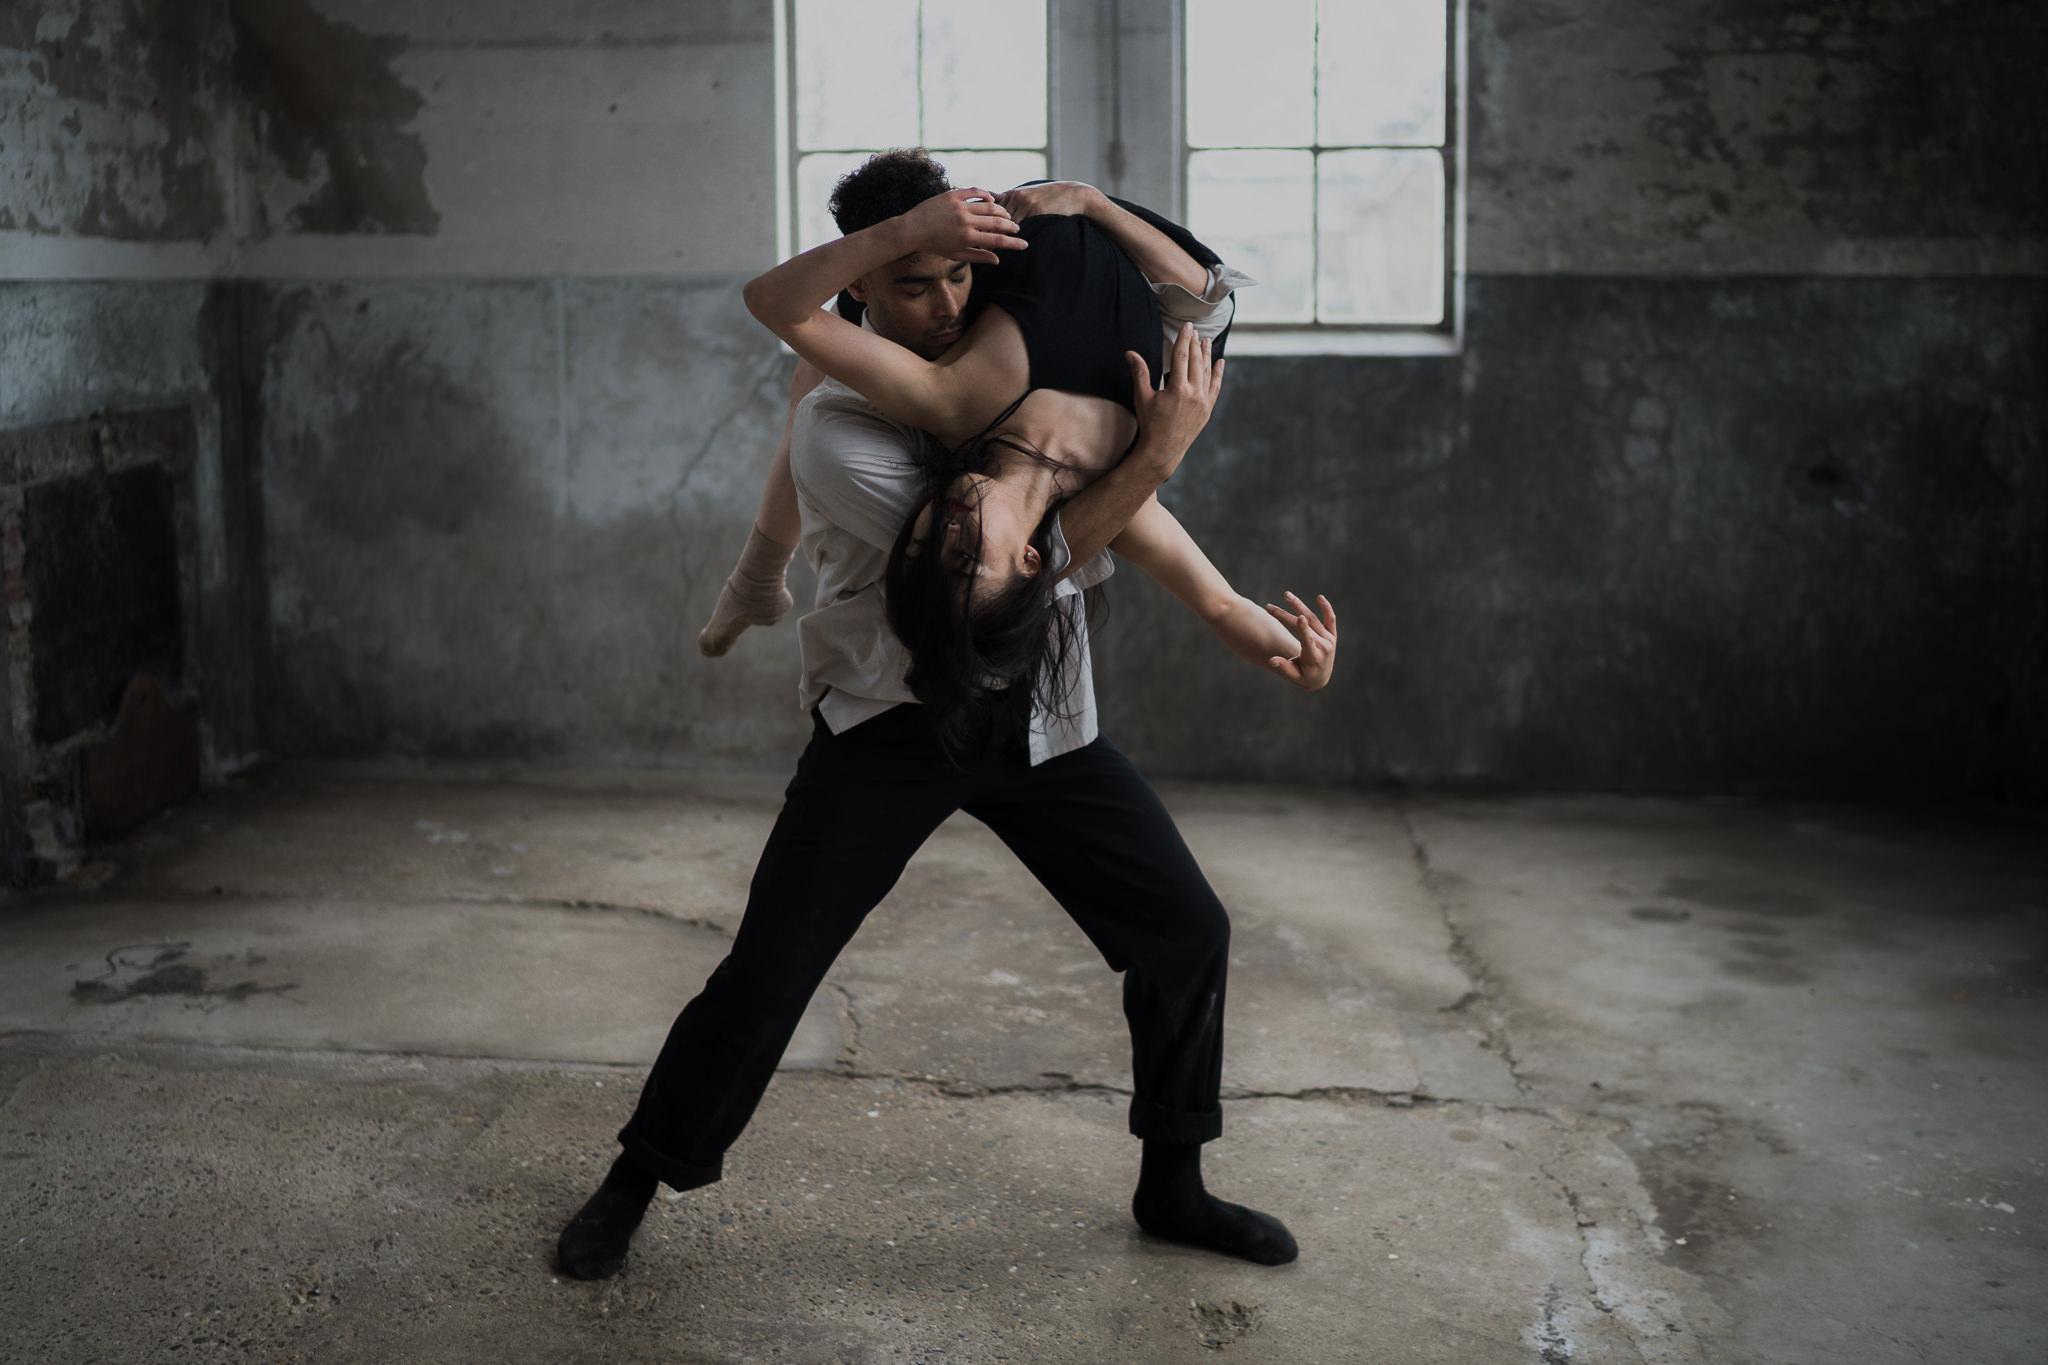 Naomi van der Kraan - Modern dance - artistic photography 07.jpg